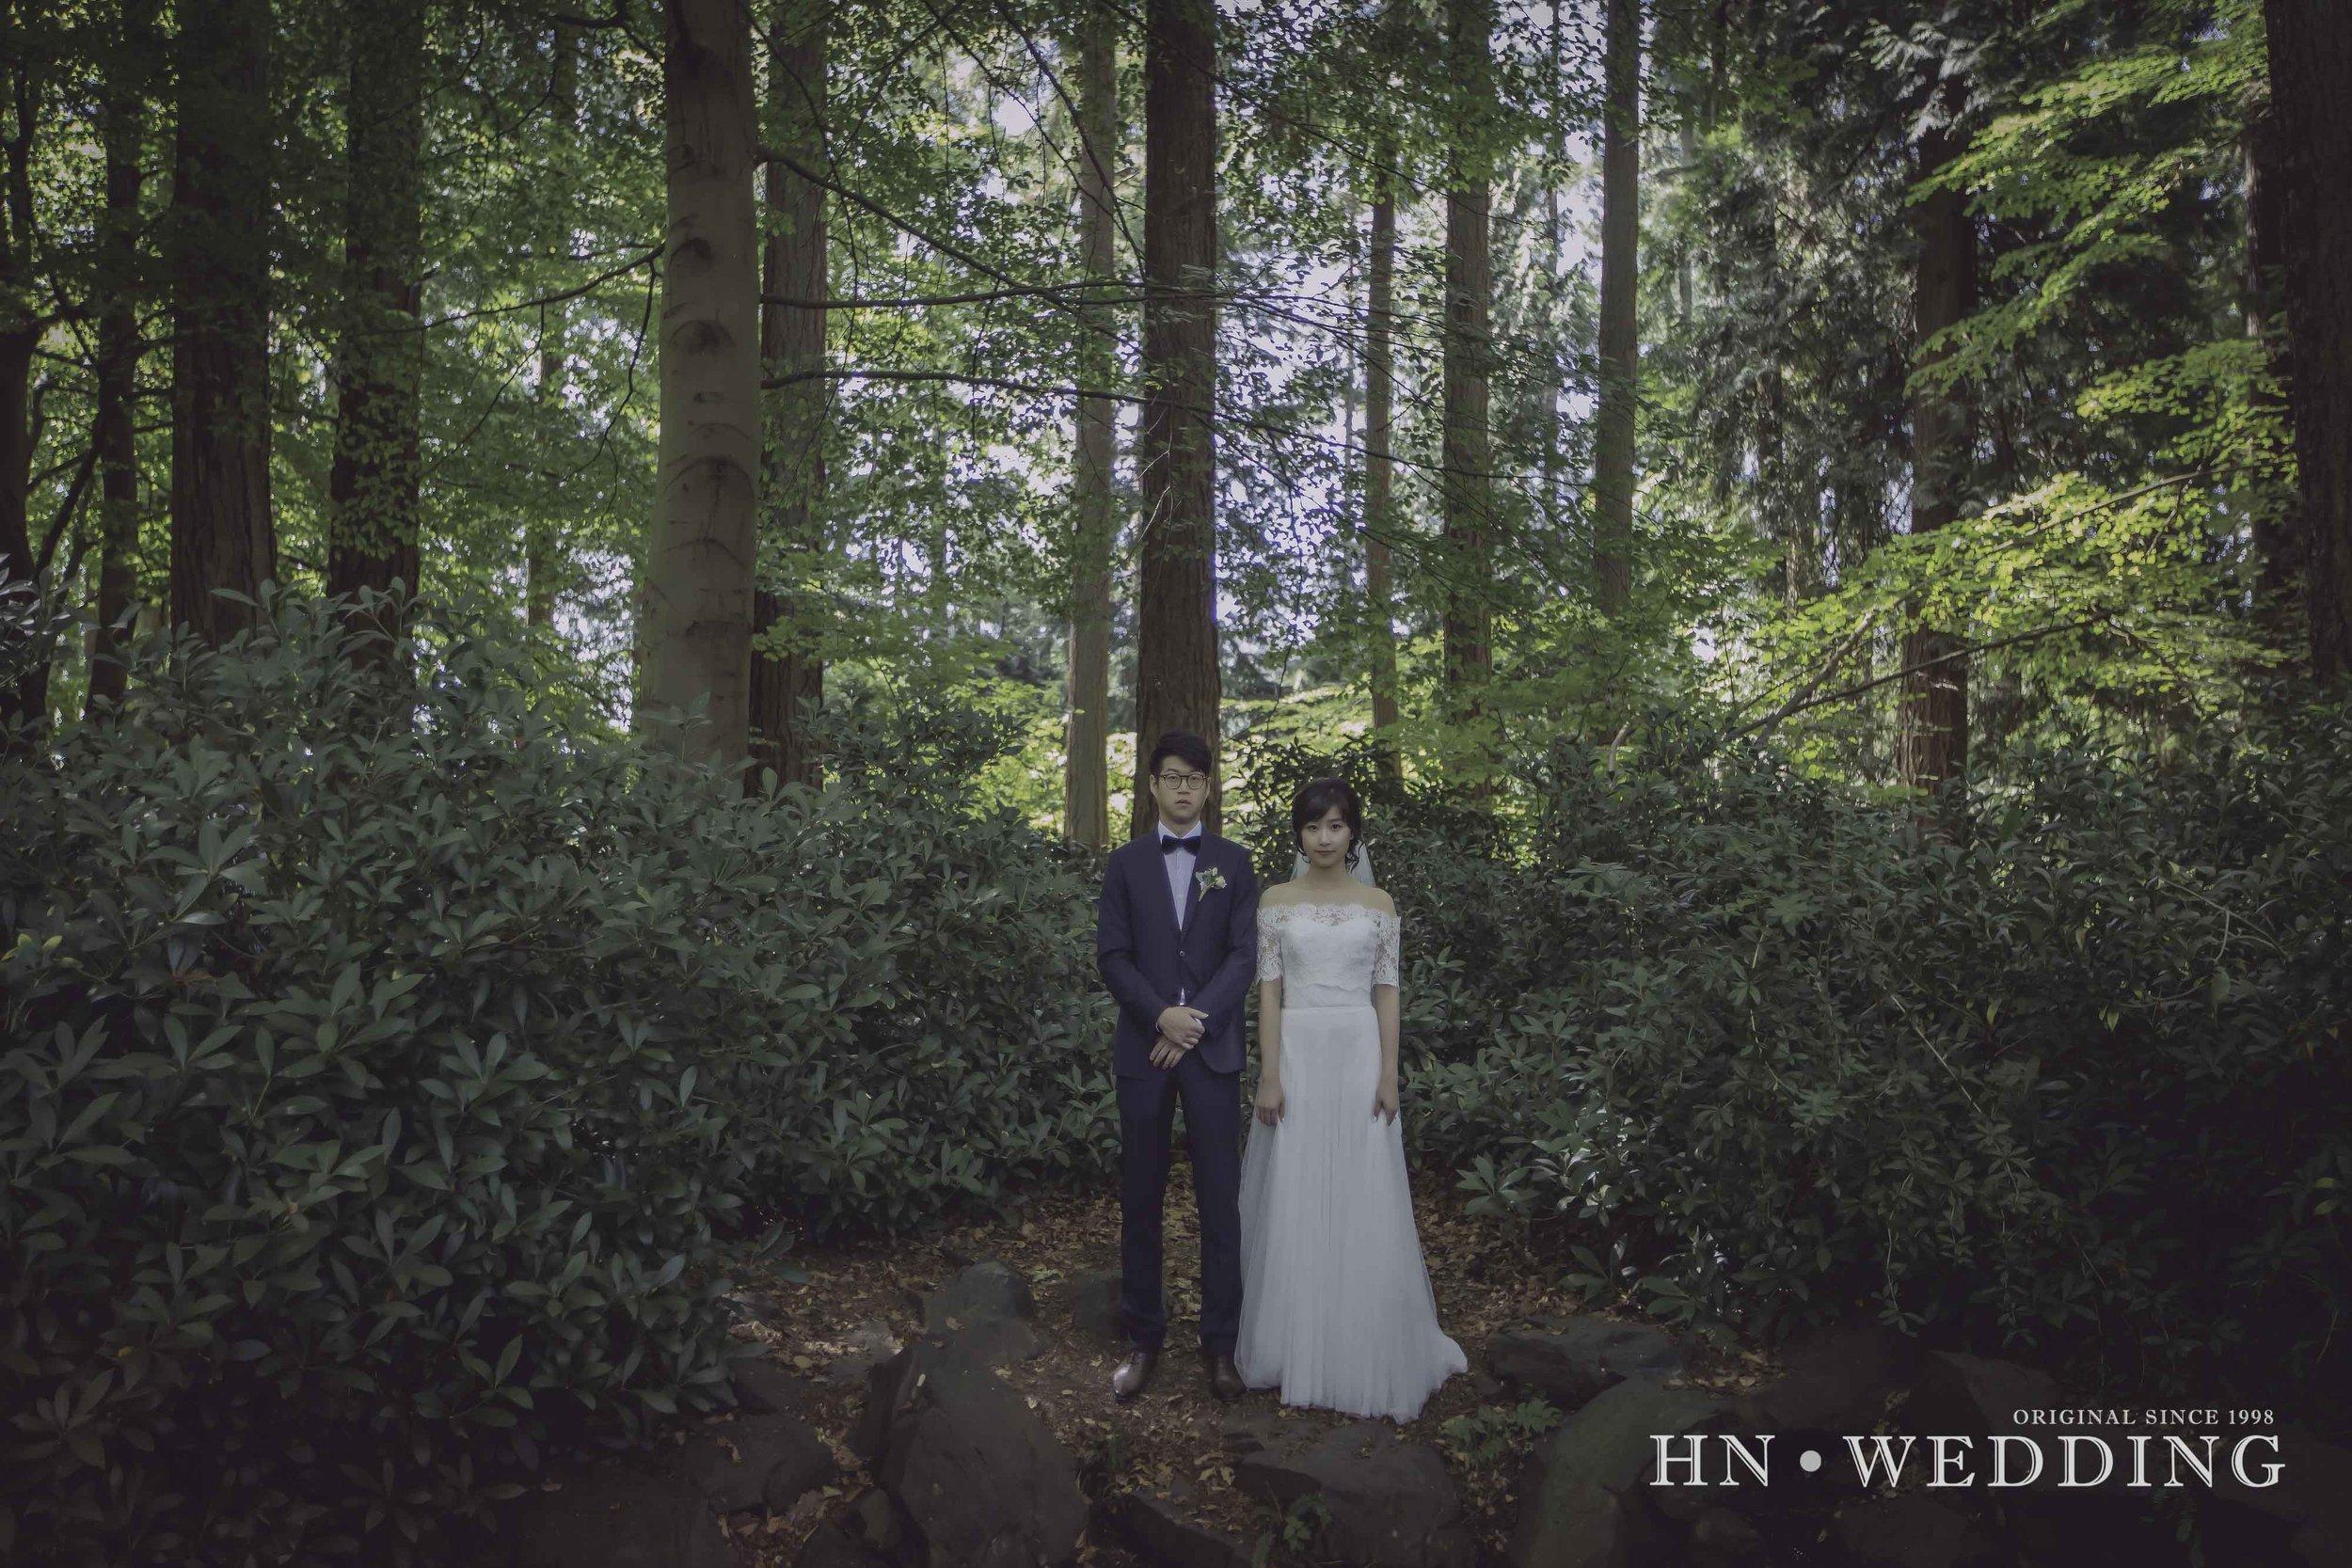 HNwedding-20160826-wedding-1558.jpg